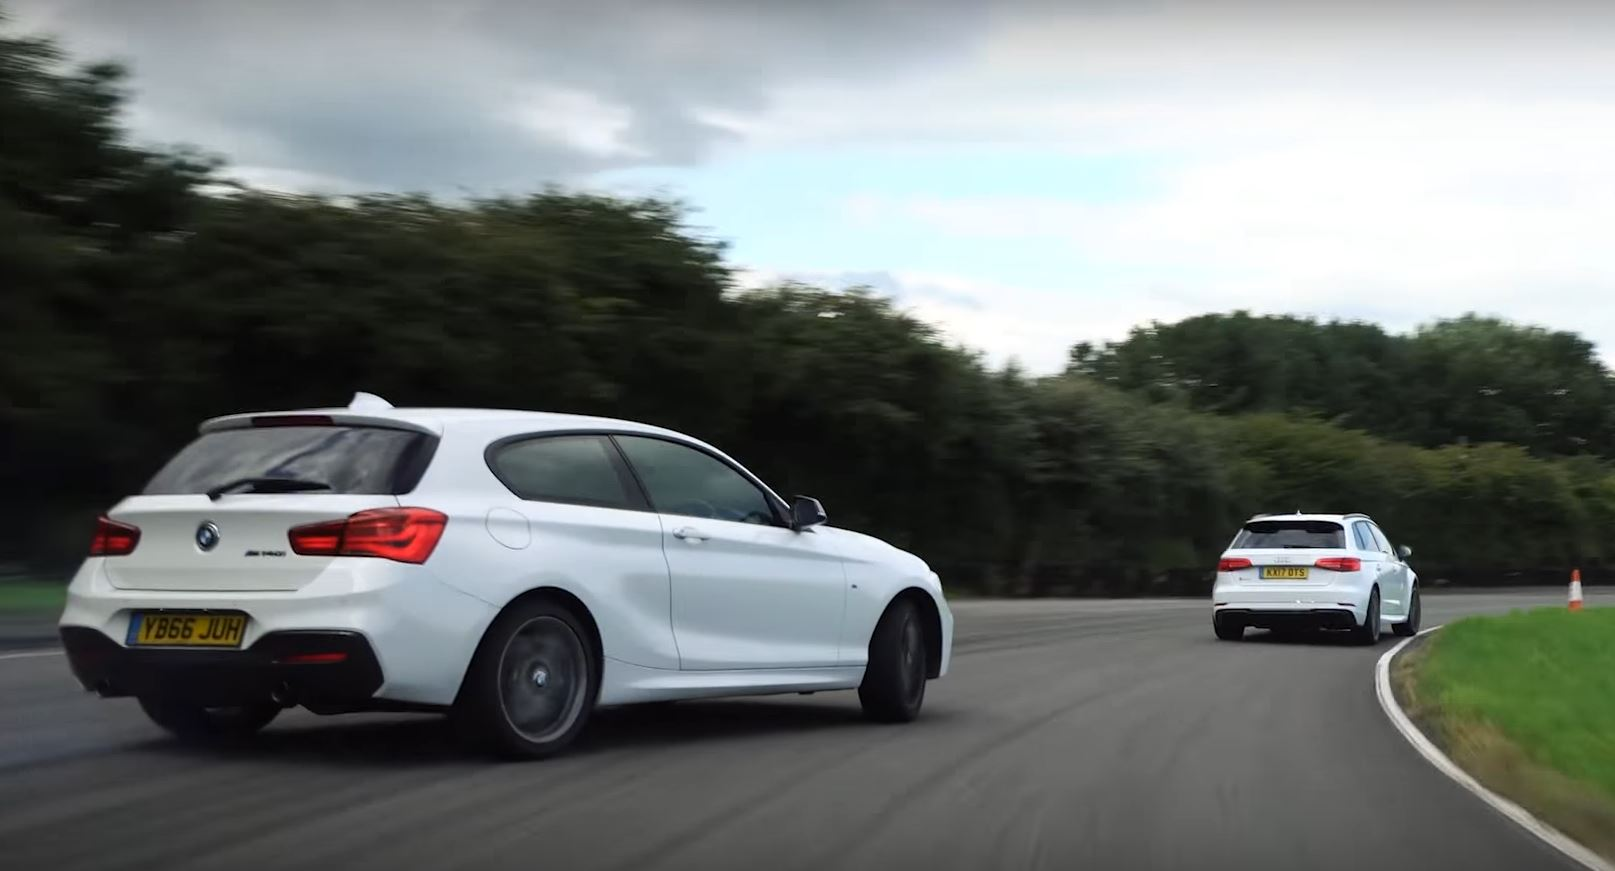 2018 Audi Rs3 Vs M140i Comparison Has Drifting